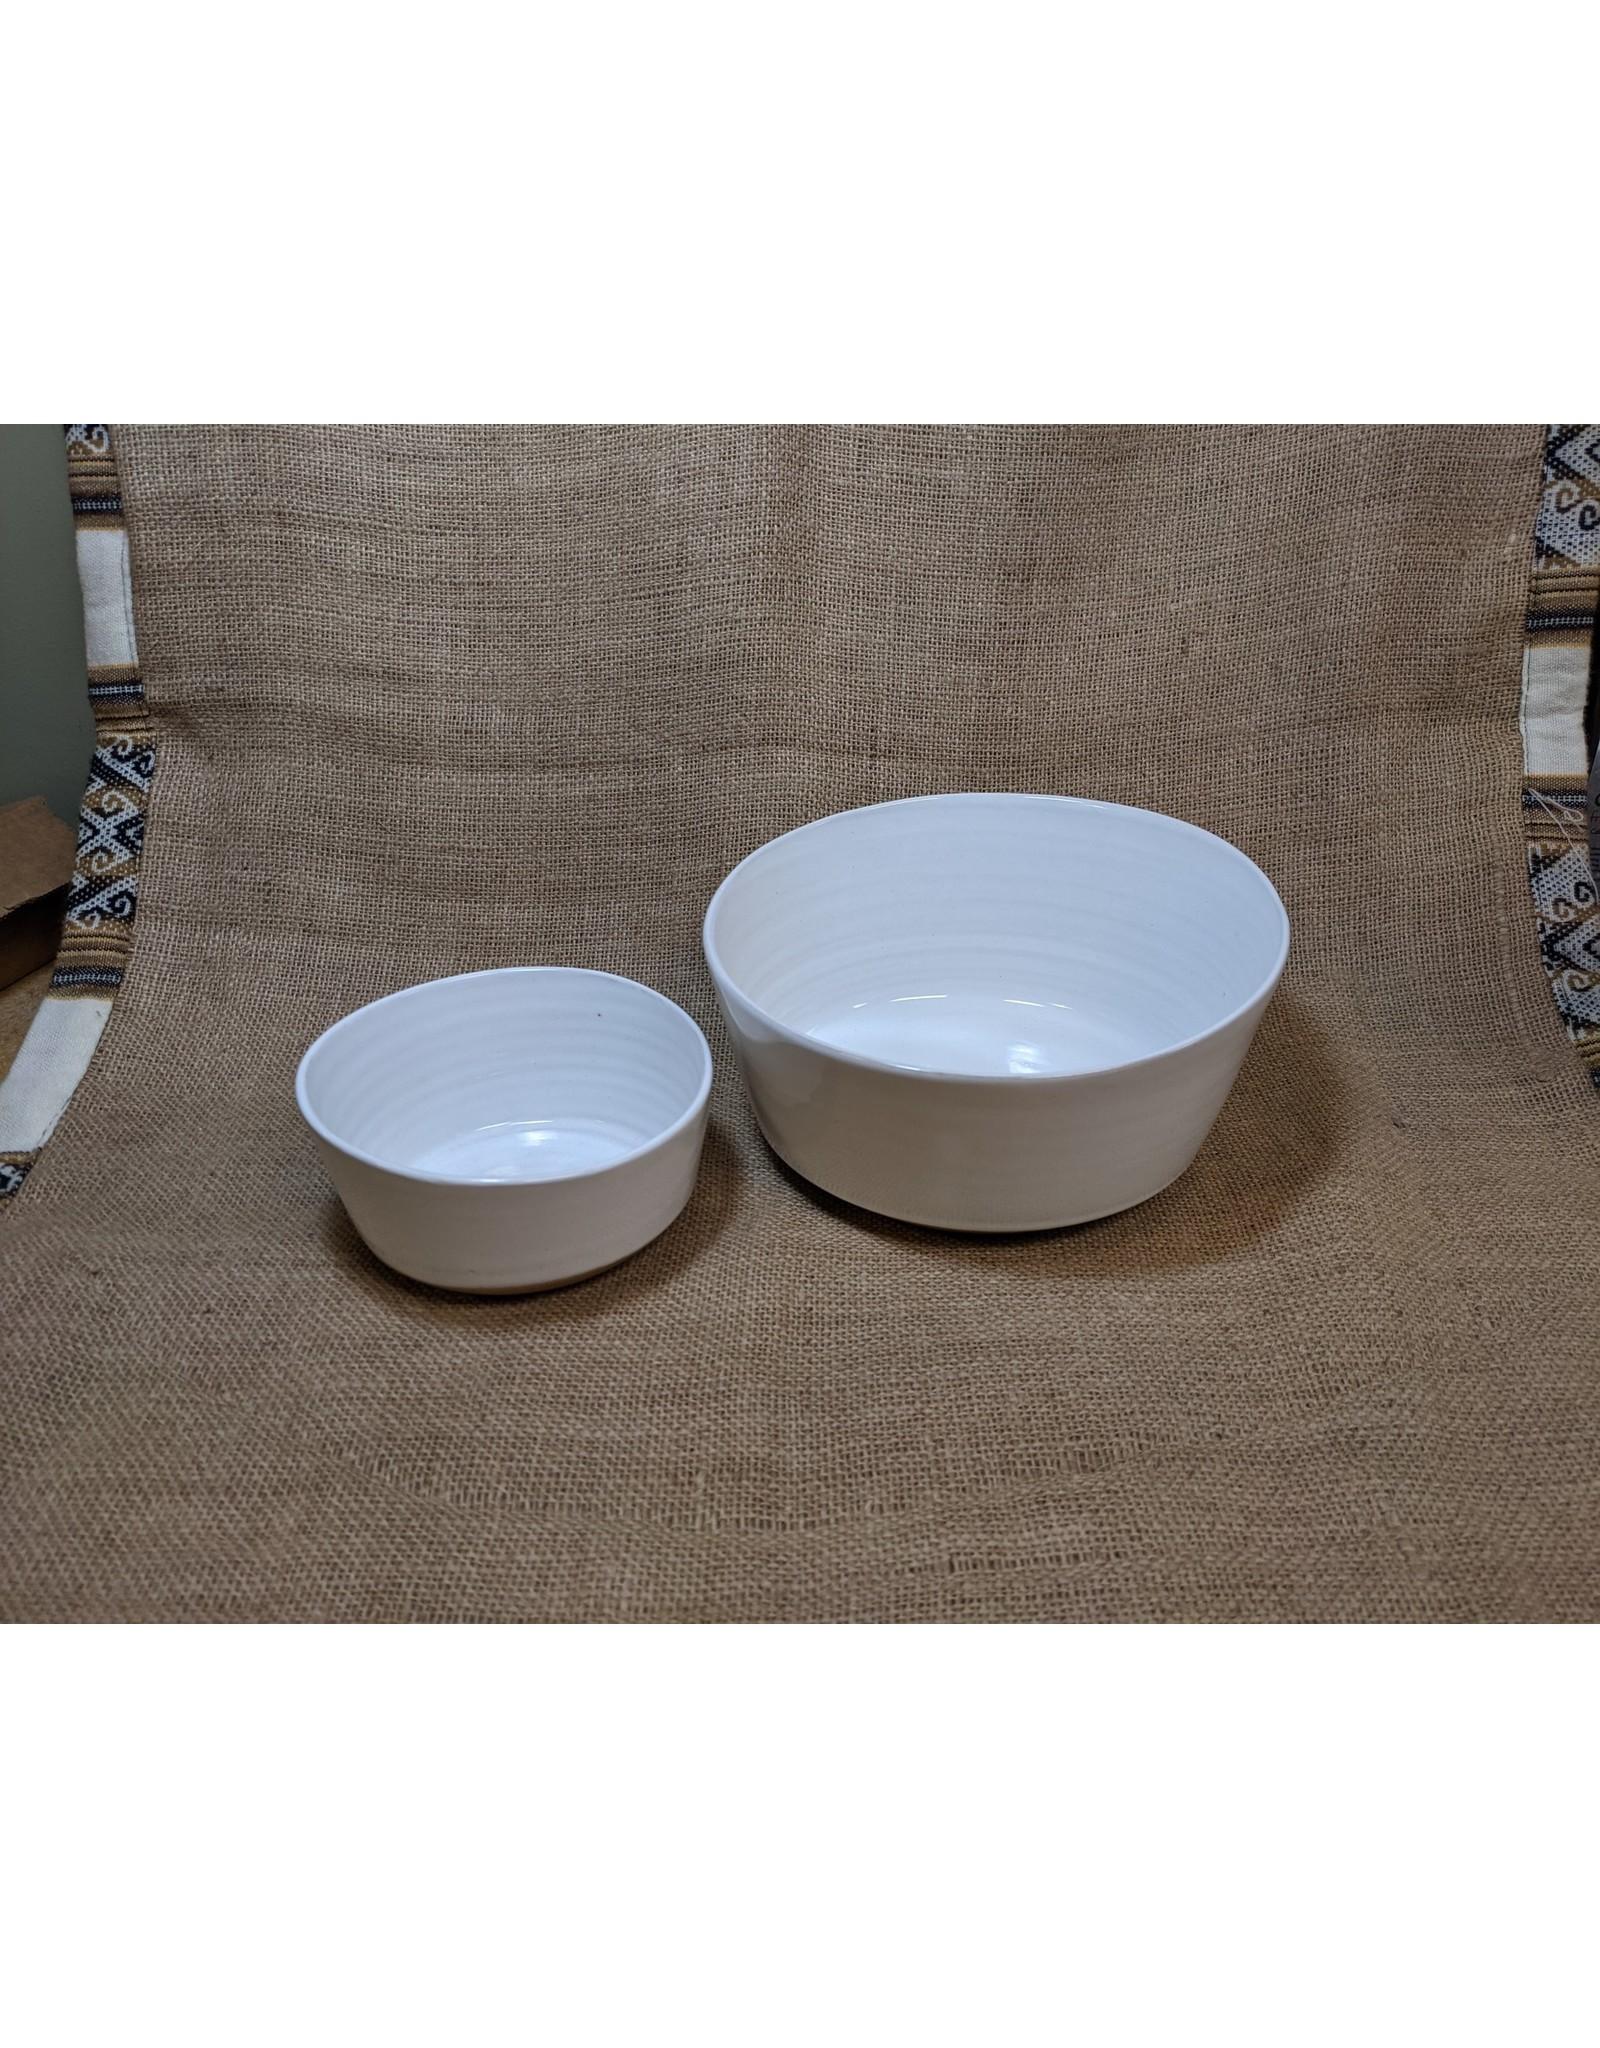 Ten Thousand Villages Soft Cloud Ceramic Bowl (Small). Nepal